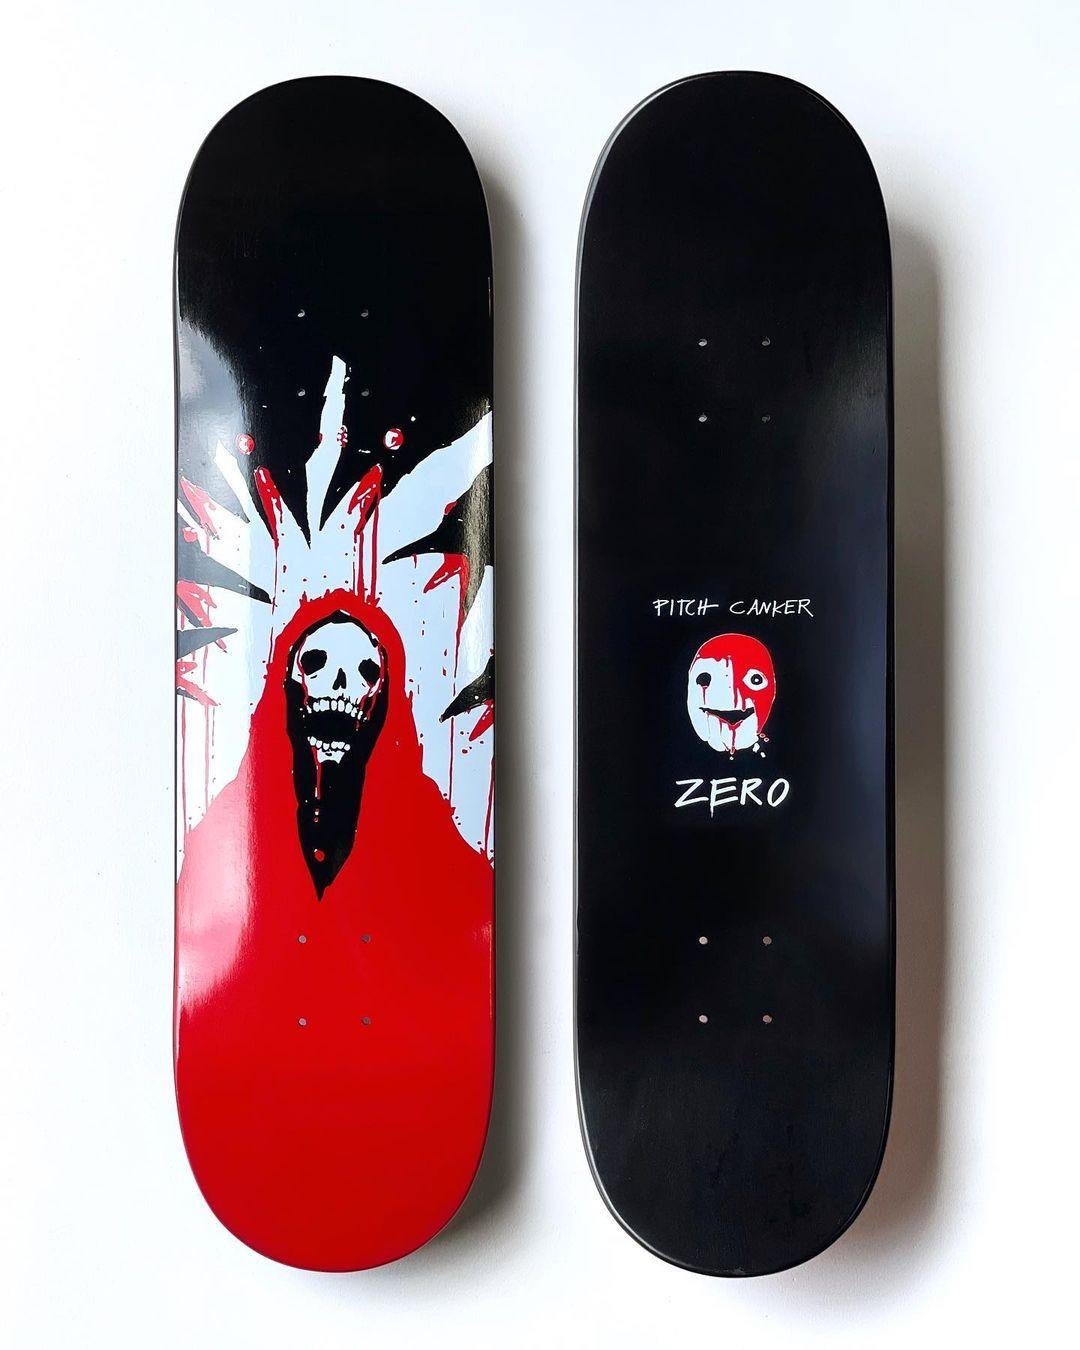 Pitch Canker X Zero Skateboards 2